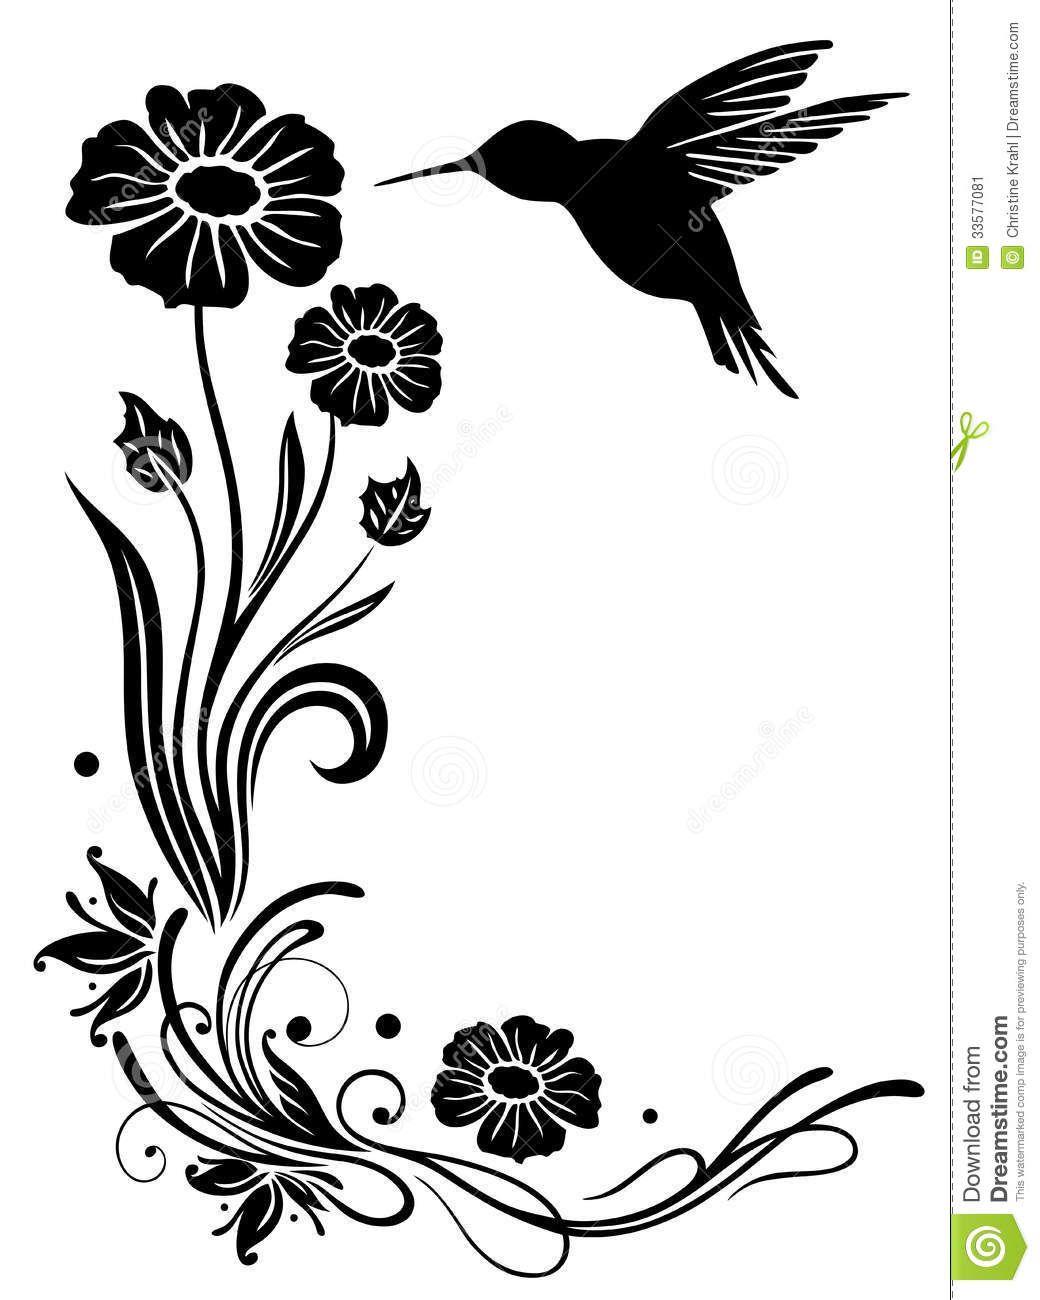 Hummingbird Flowers Stock Image